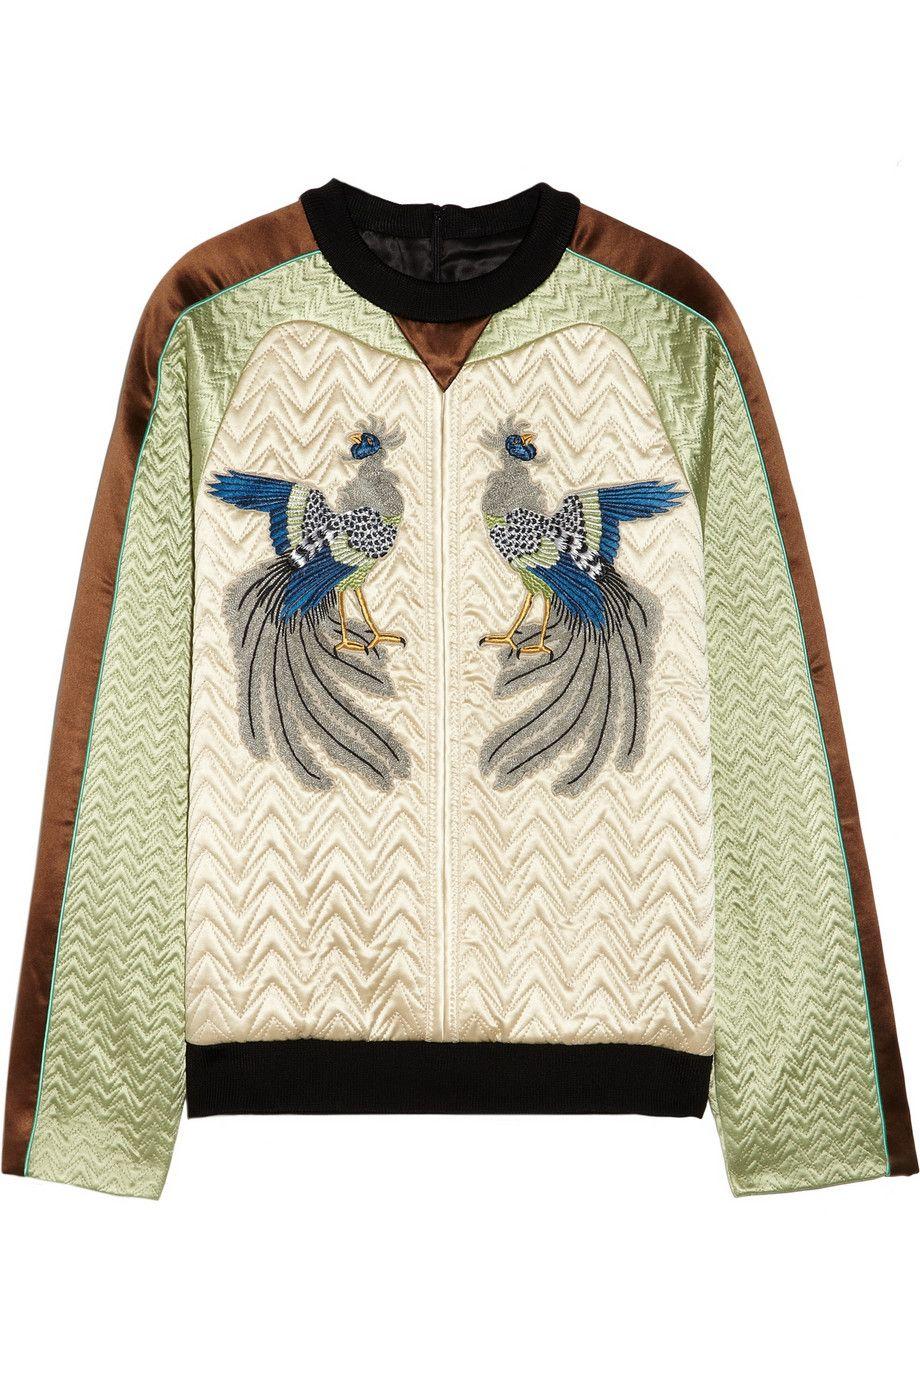 Proenza Schouler Embroidered quilted silk-satin sweatshirt